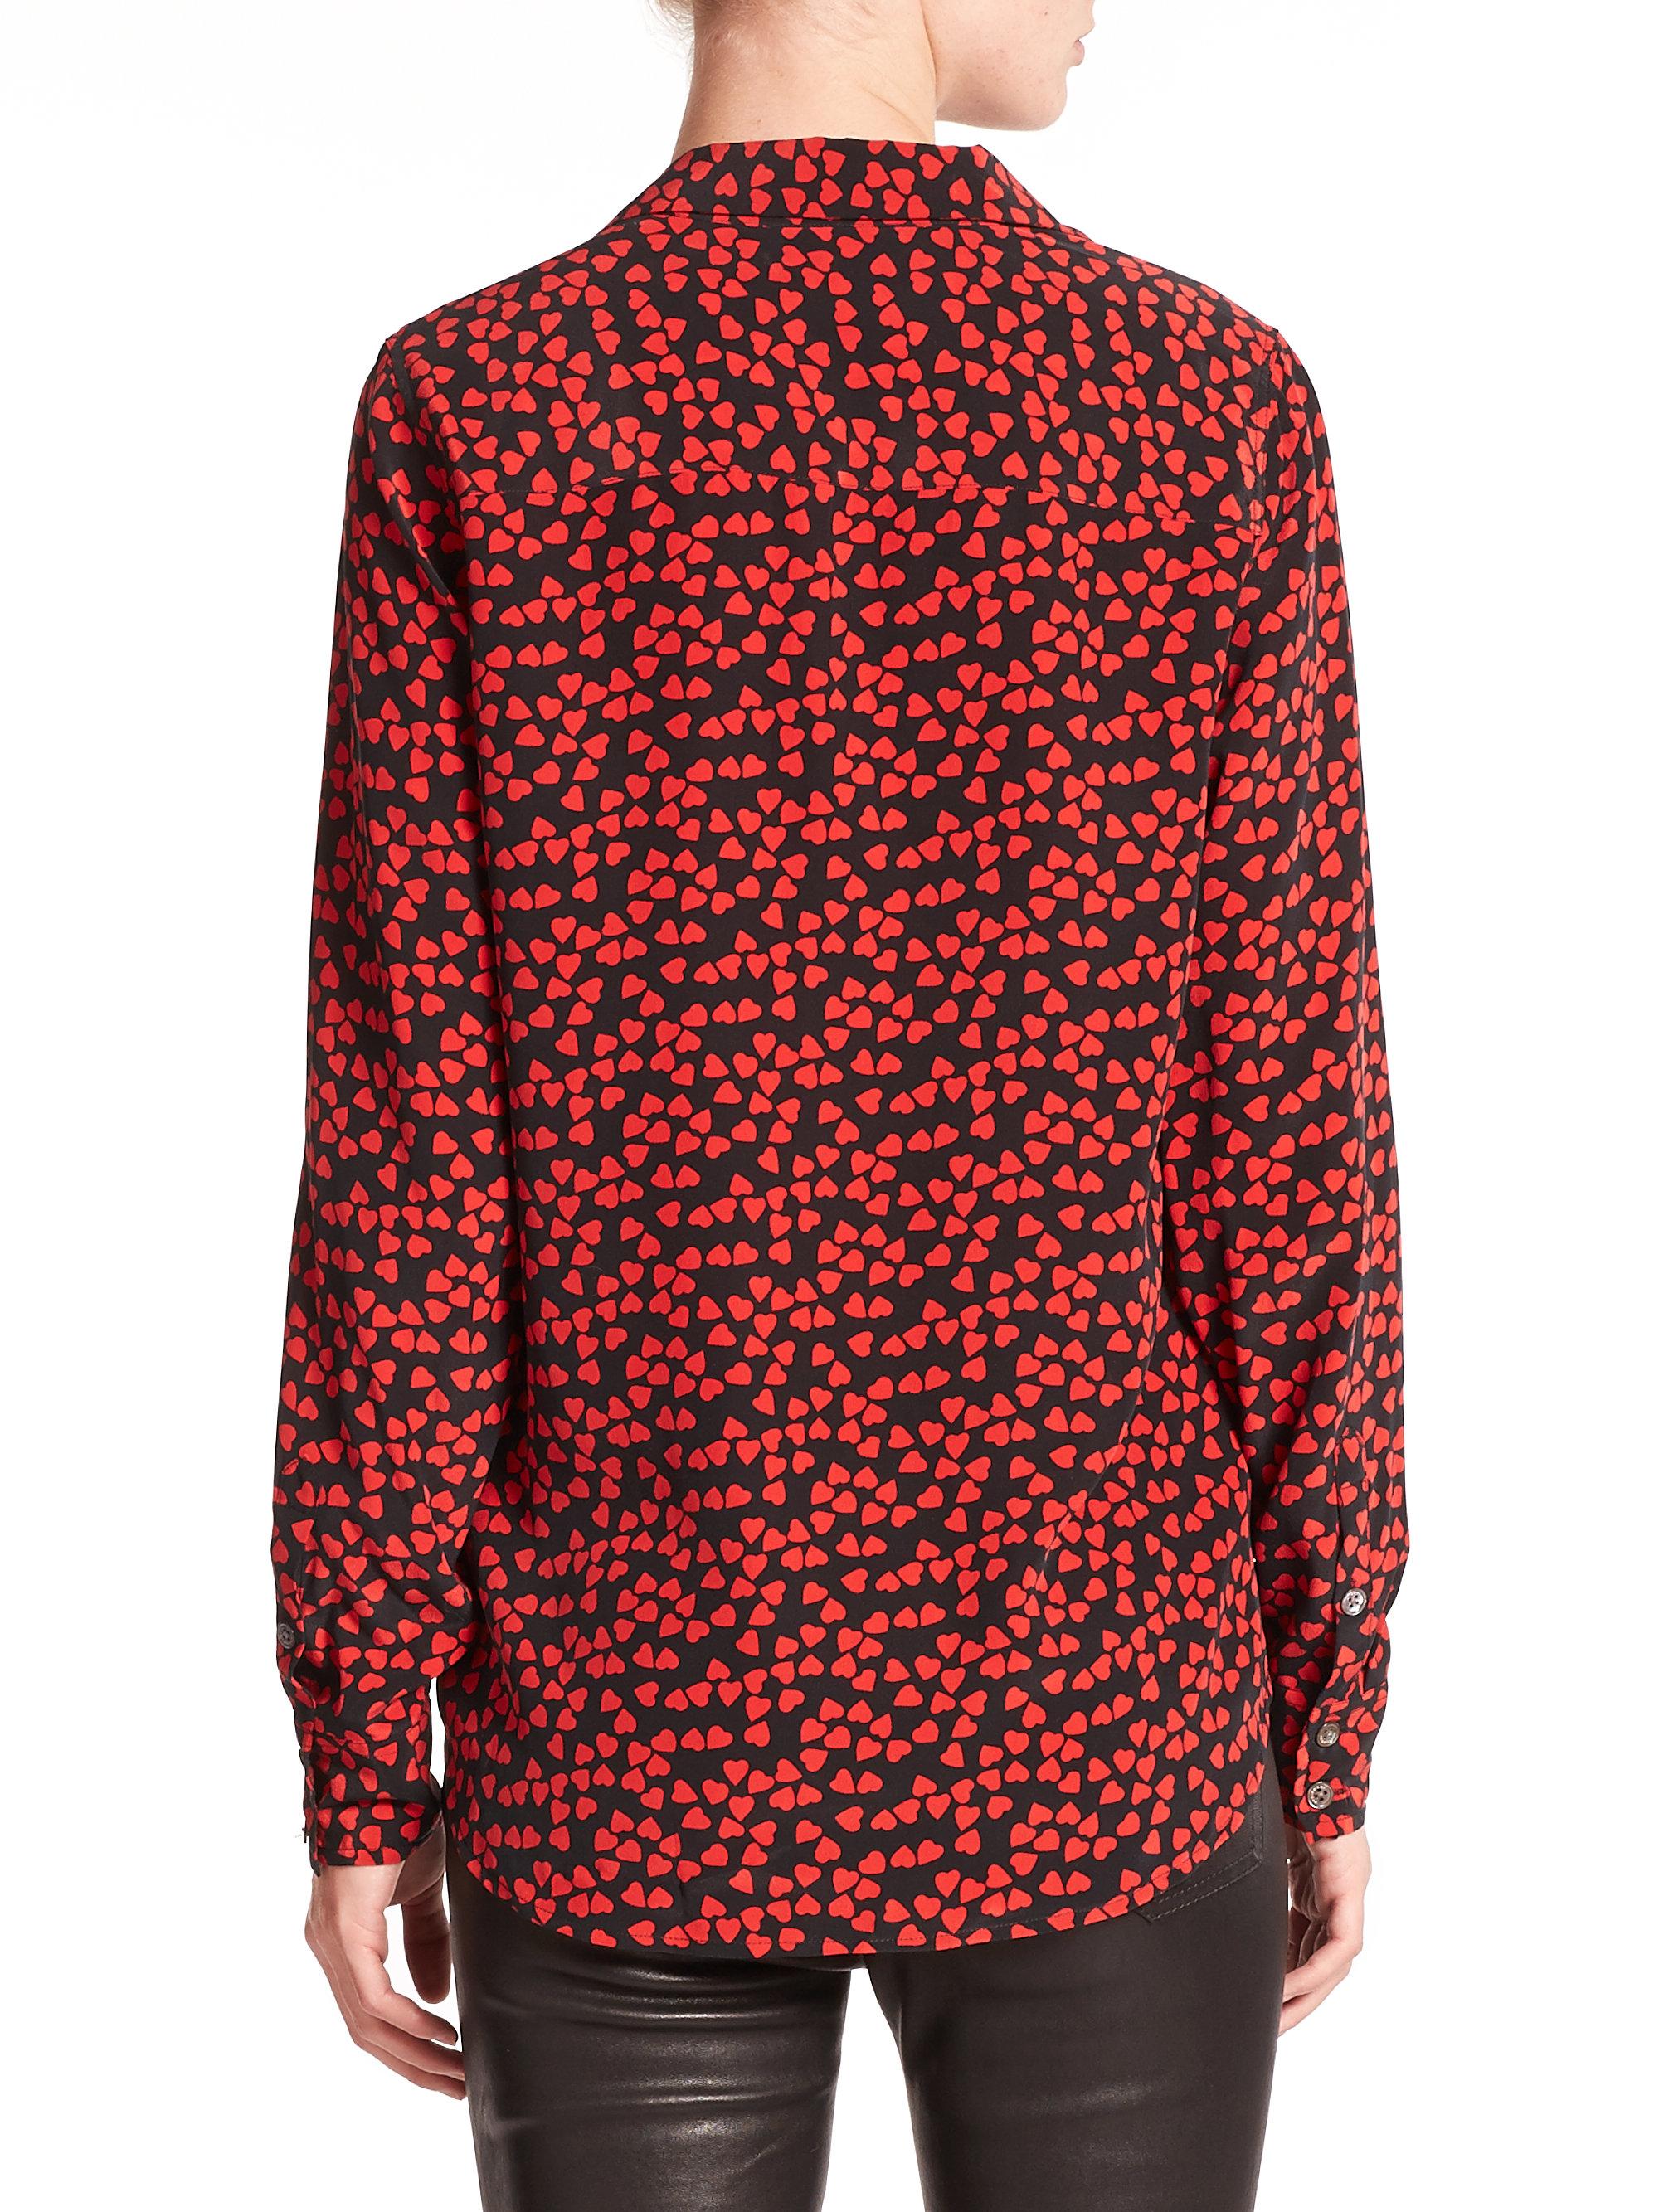 Equipment silk adalyn shirt in red lyst for Equipment black silk shirt